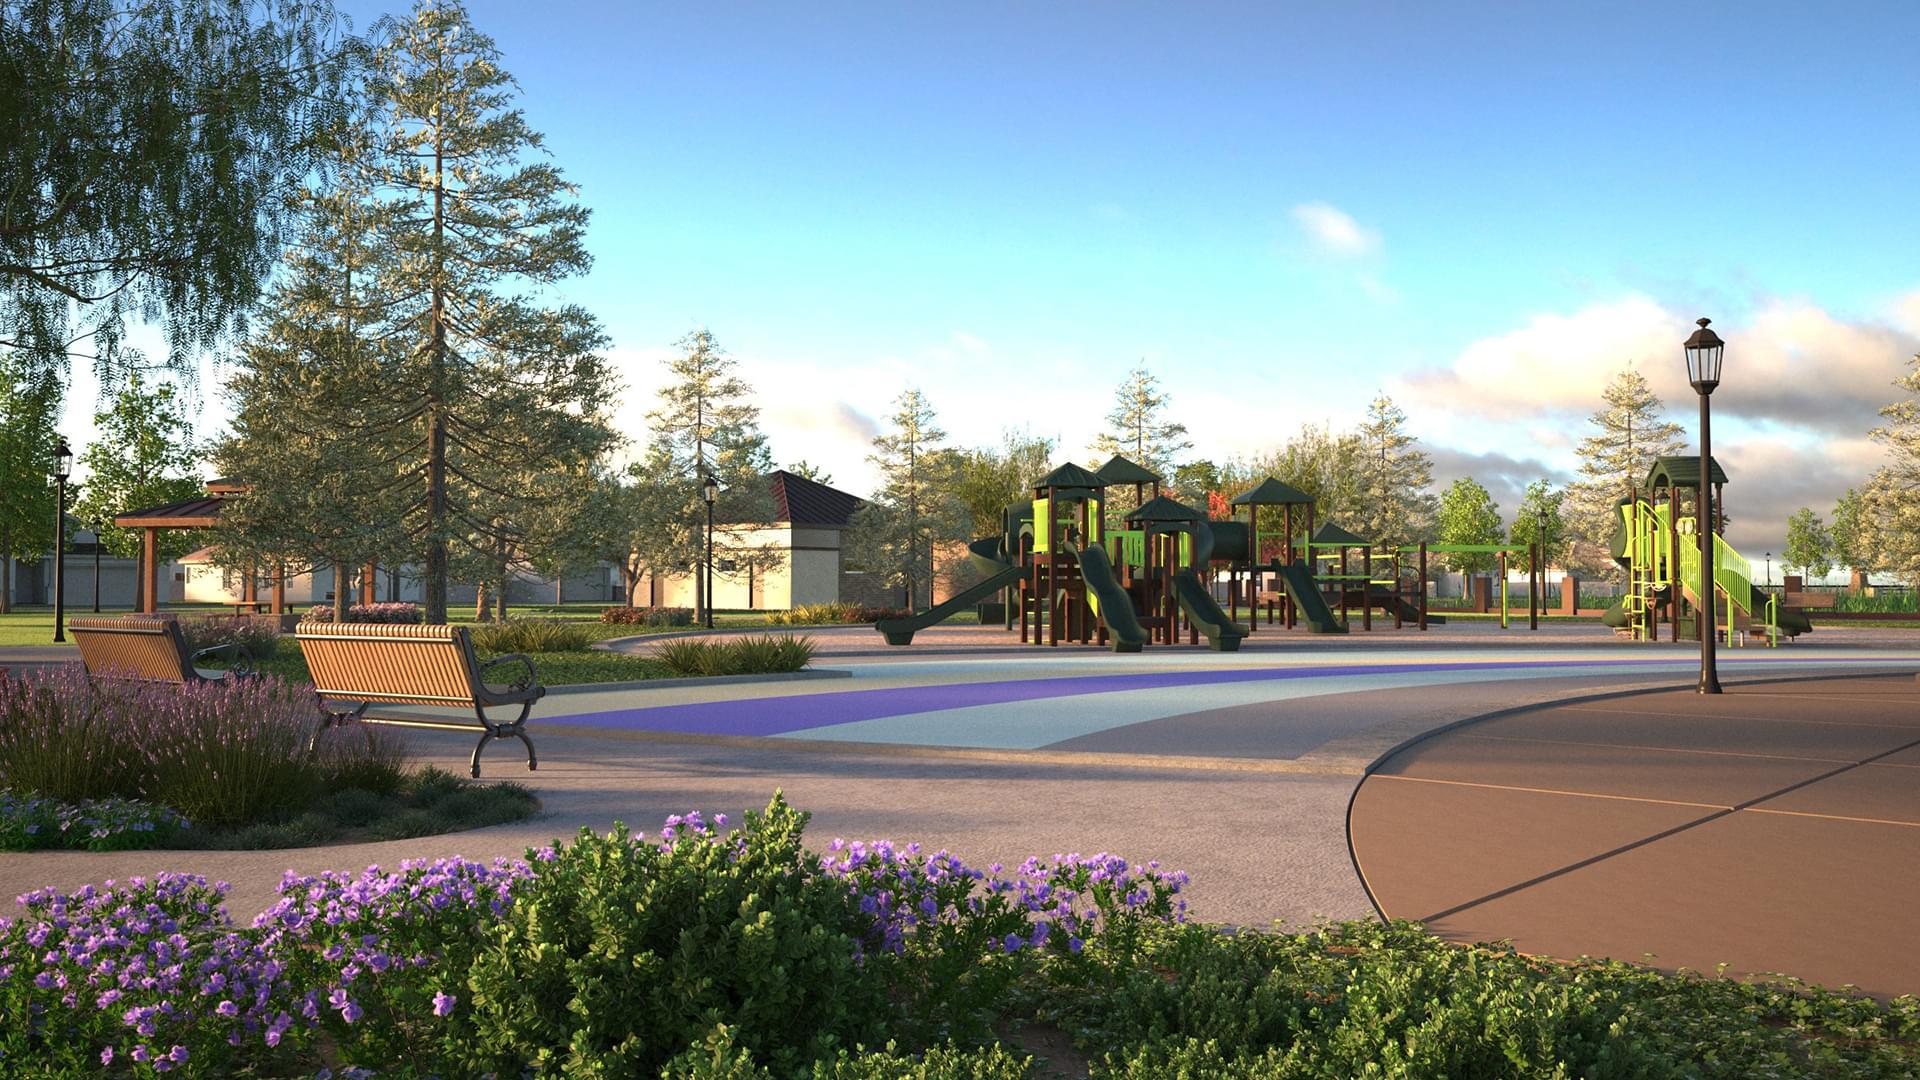 Delaney Park Park & Playground